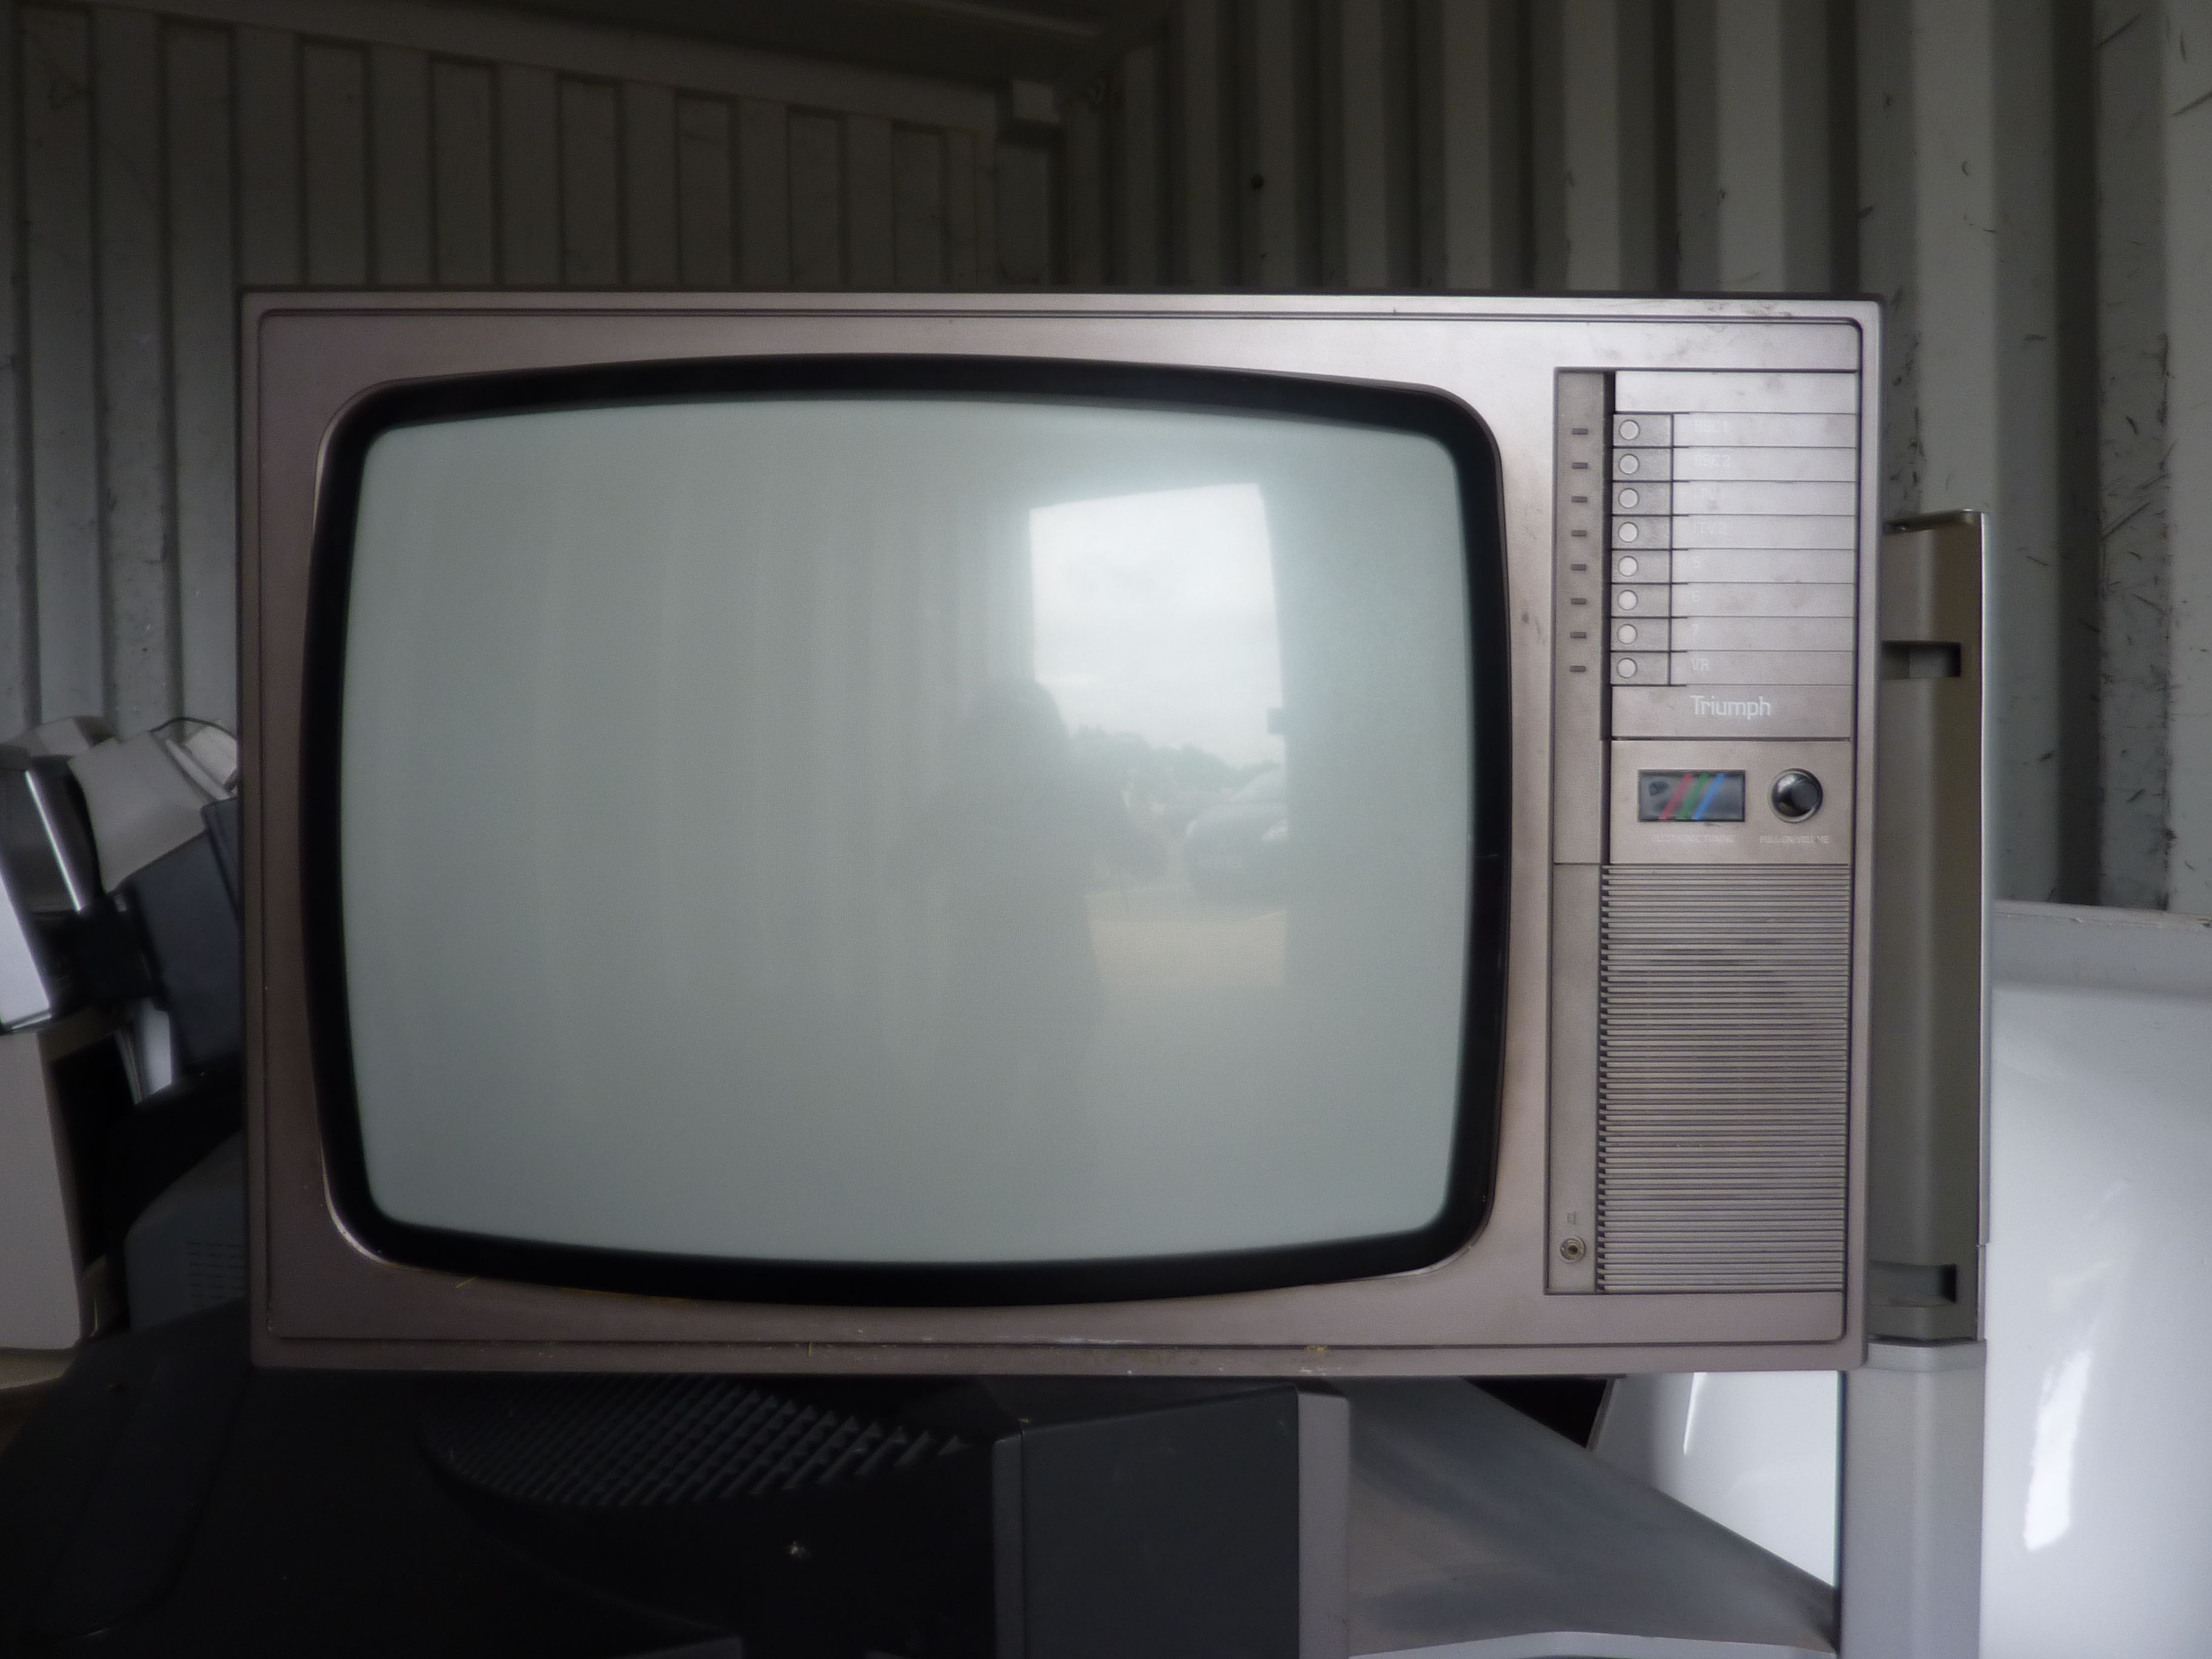 Triumph Tv 70 S 80 S